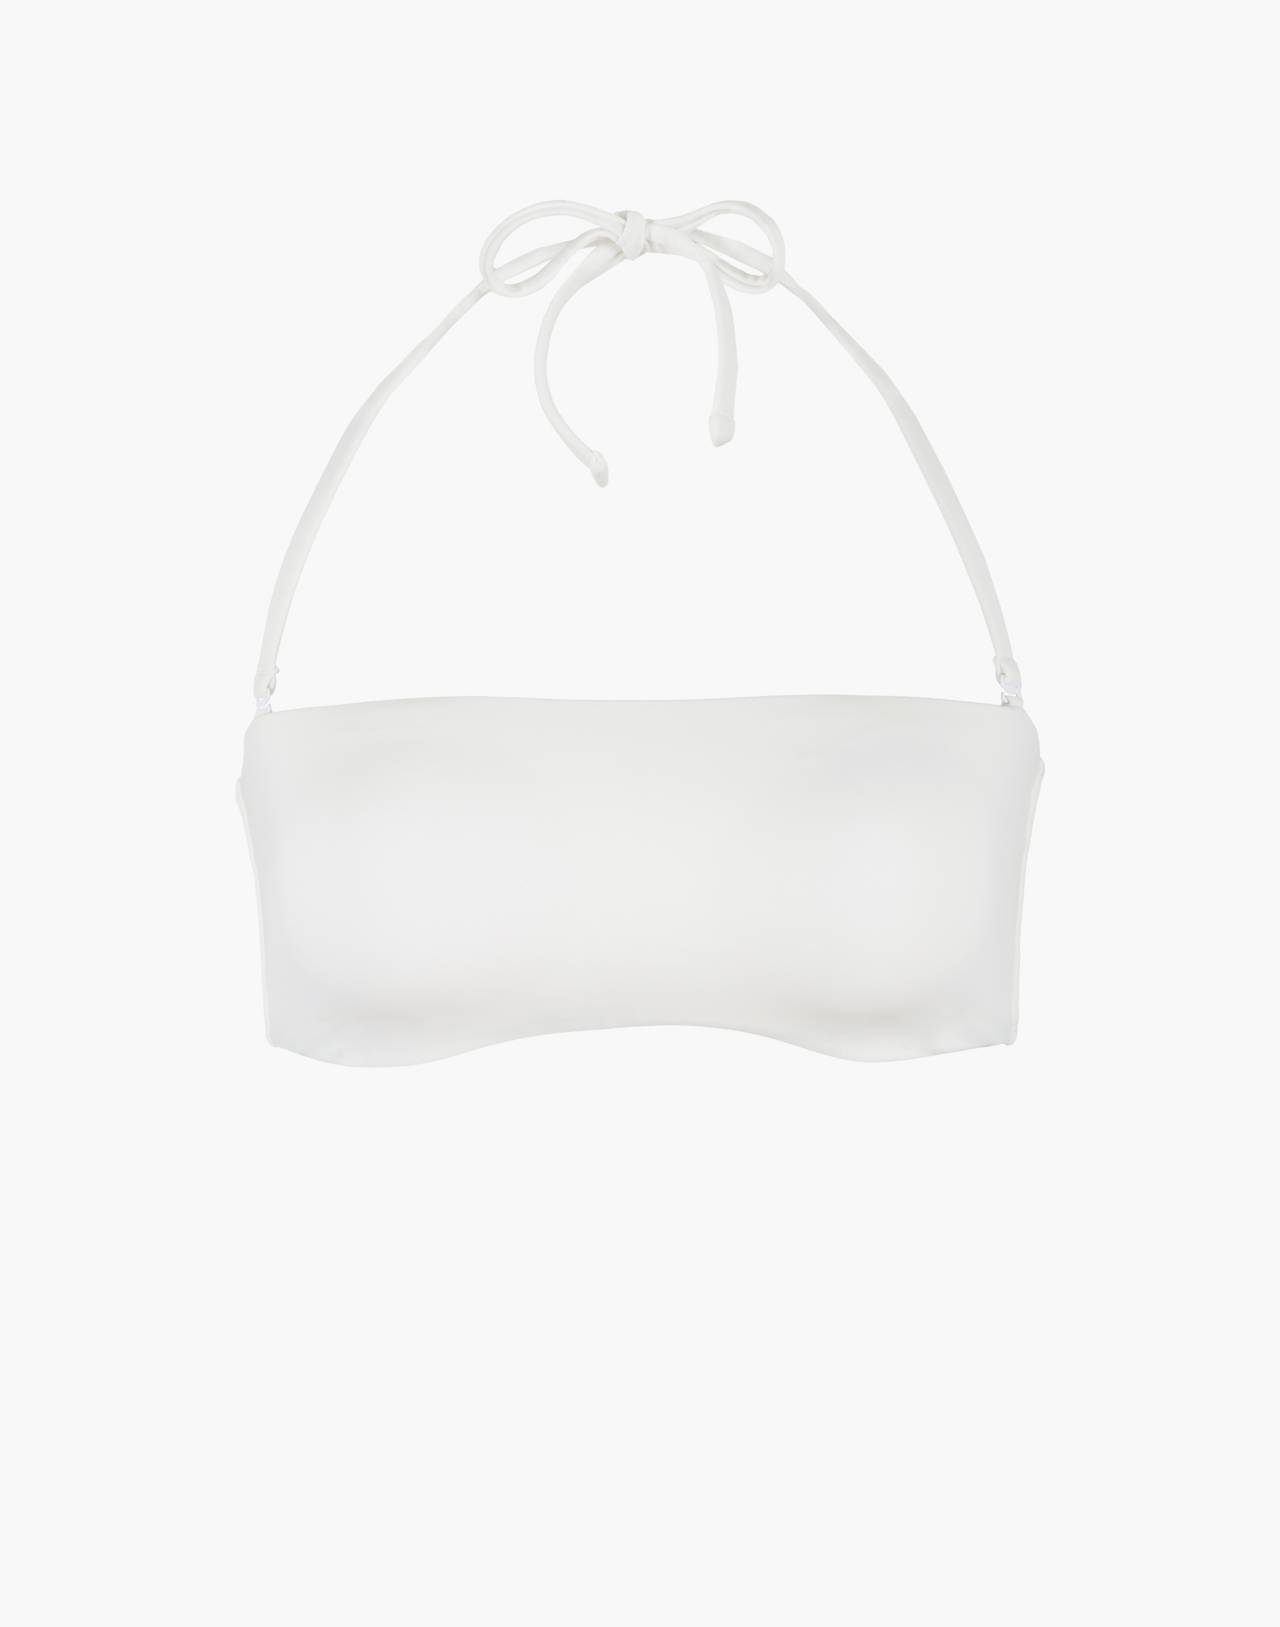 LIVELY™ Bandeau Bikini Top in white image 3